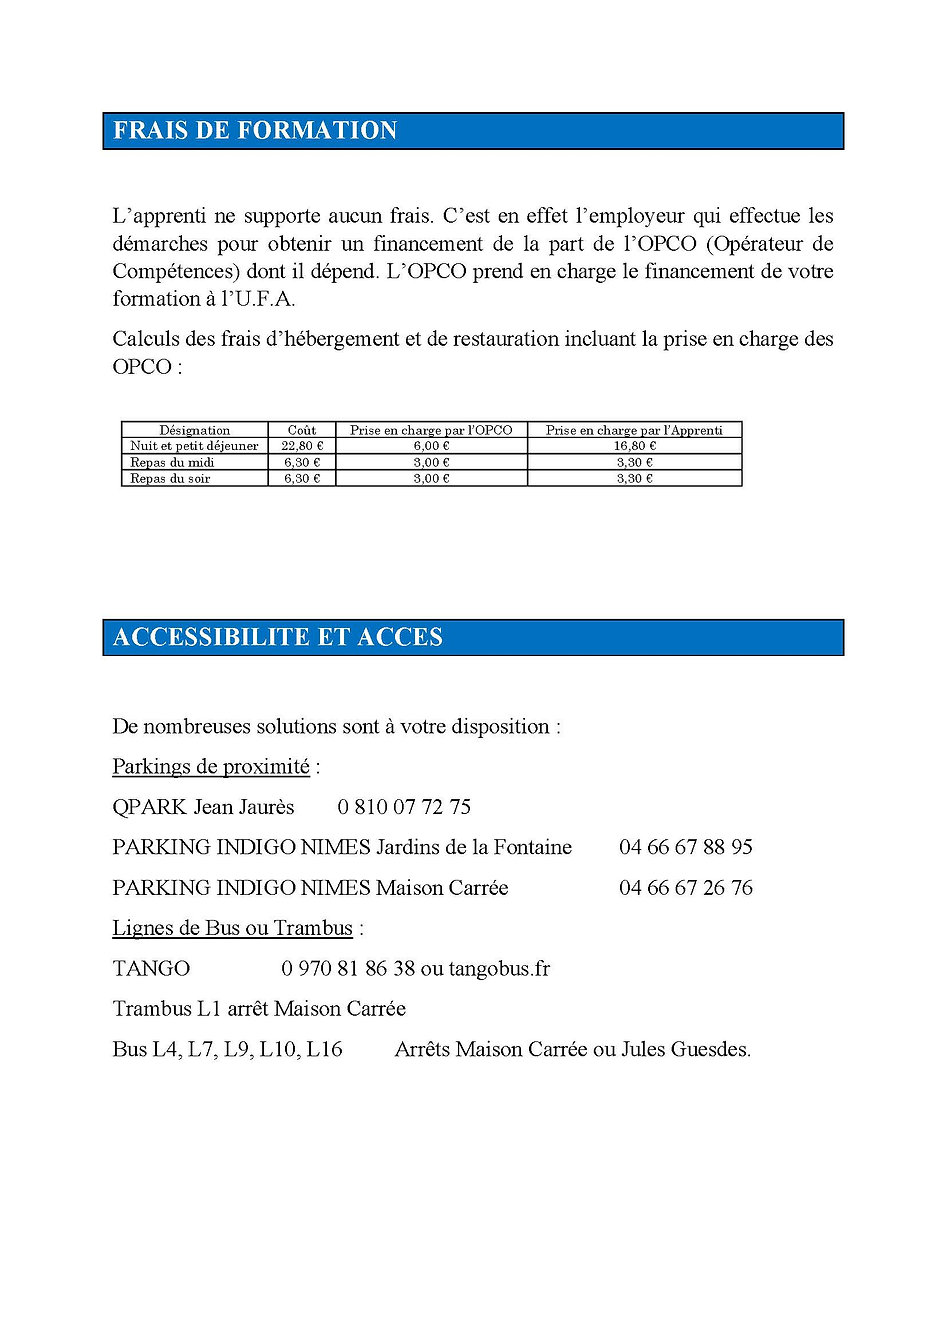 FICHE METIER DIPLOME BTS DEF_Page_7.jpg